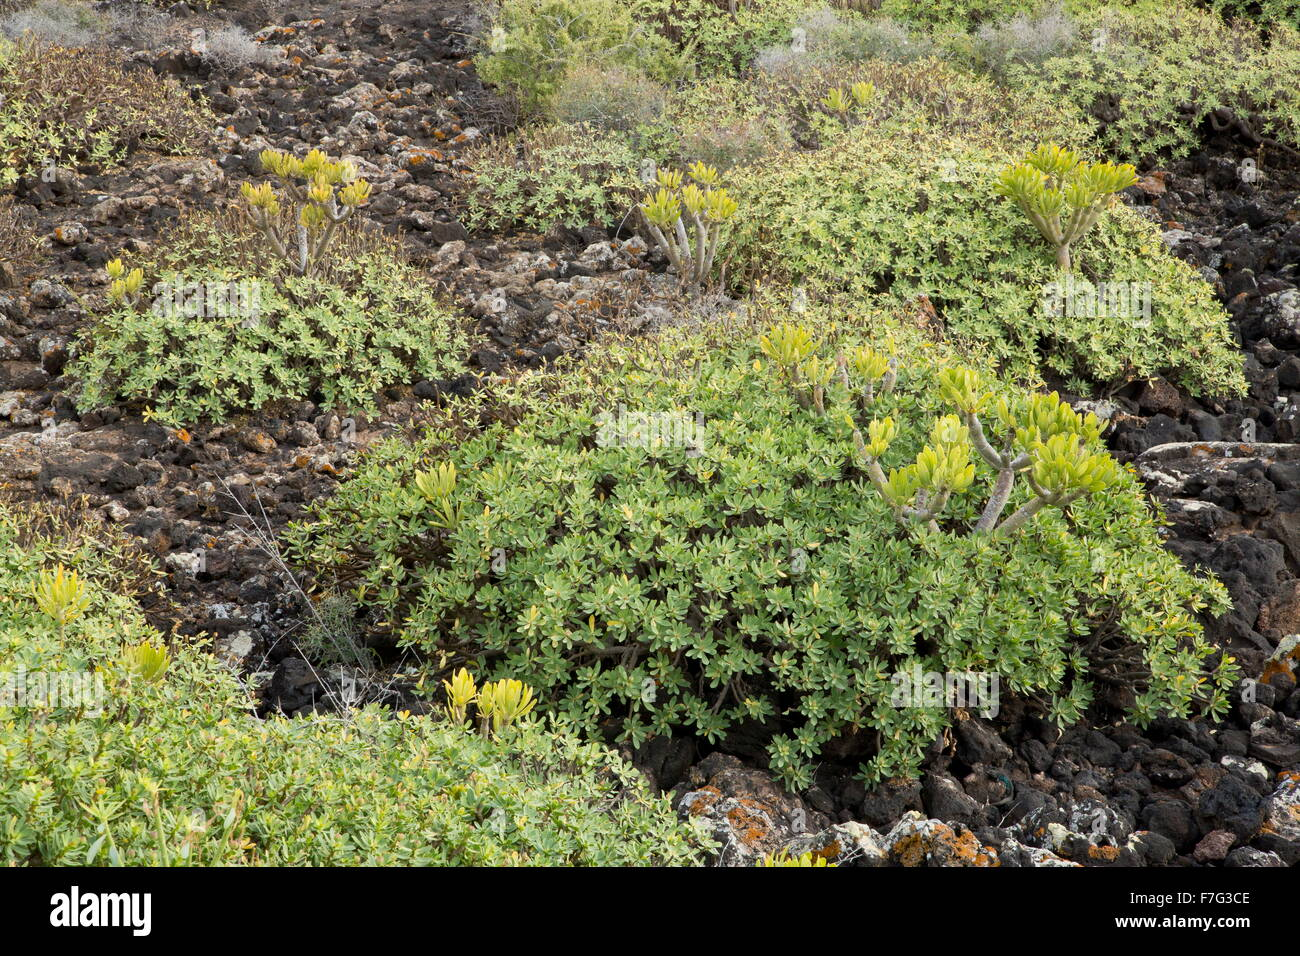 Two Canaries succulents, Verode (Kleinia neriifolia), and Balsam Spurge, Euphorbia balsamifera.  Lanzarote. Stock Photo